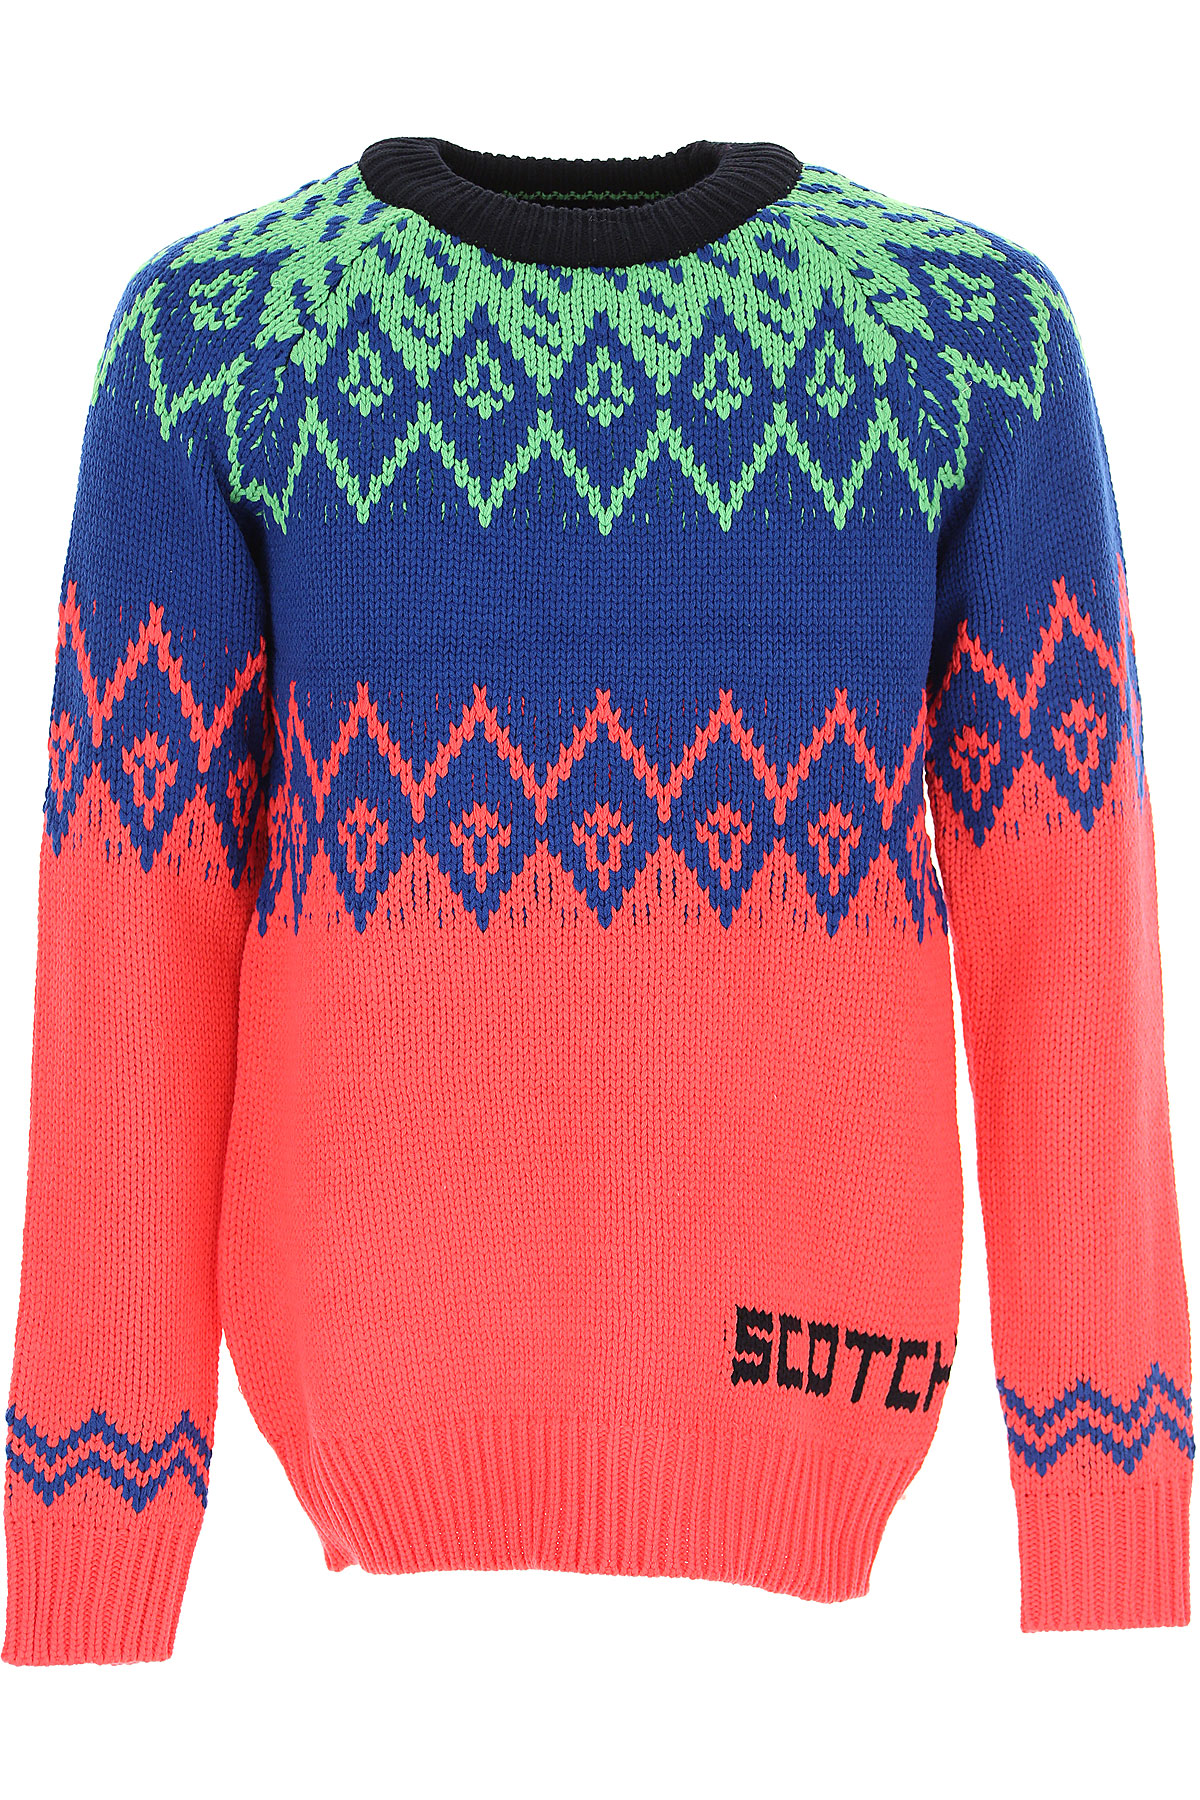 Scotch & Soda Sweater for Men Jumper On Sale, Bluette, Acrylic, 2019, L M XL